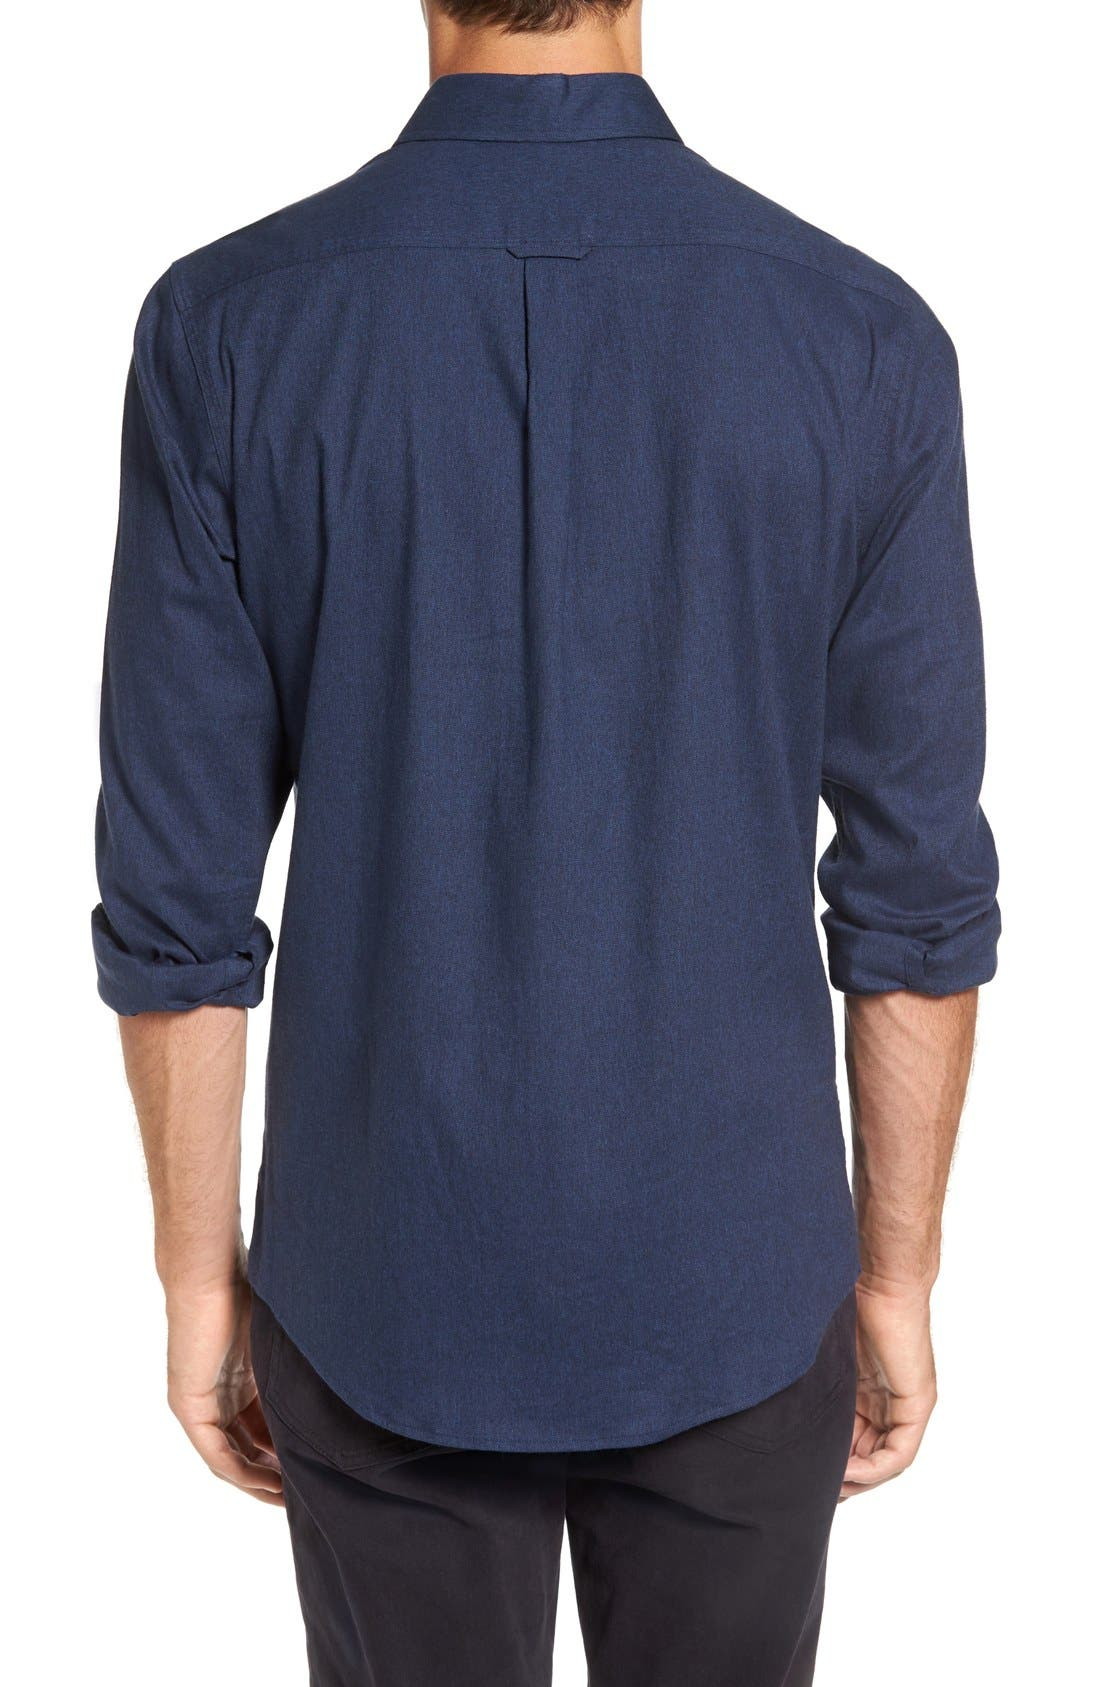 Alternate Image 2  - Rodd & Gunn 'Sinclair' Trim Fit Brushed Twill Sport Shirt